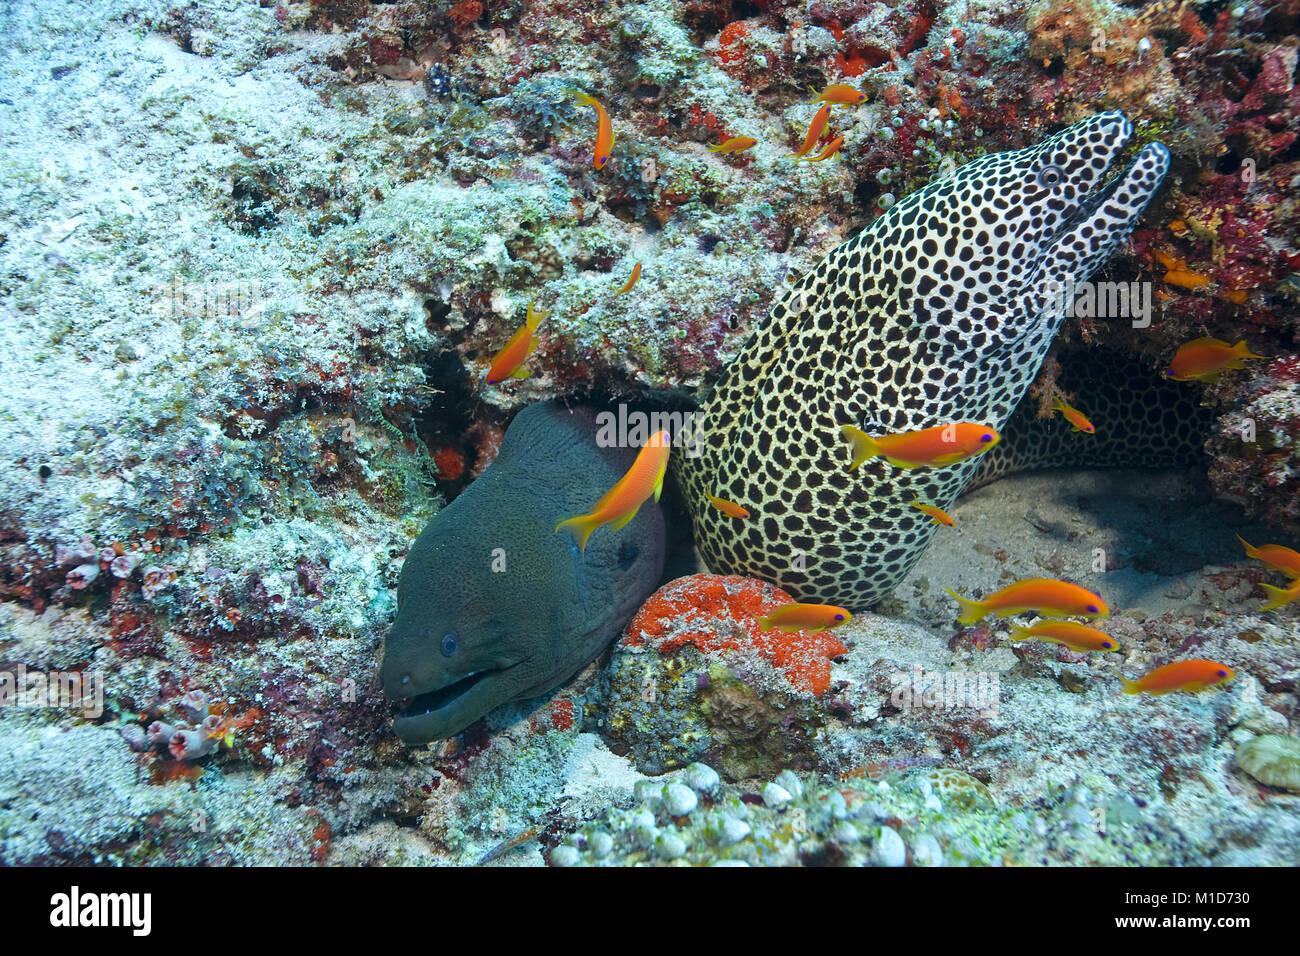 Living community, Giant moray (Gymnothorax javanicus) and Honeycomb moray (Gymnothorax favagineus), Maldives islands, Stock Photo